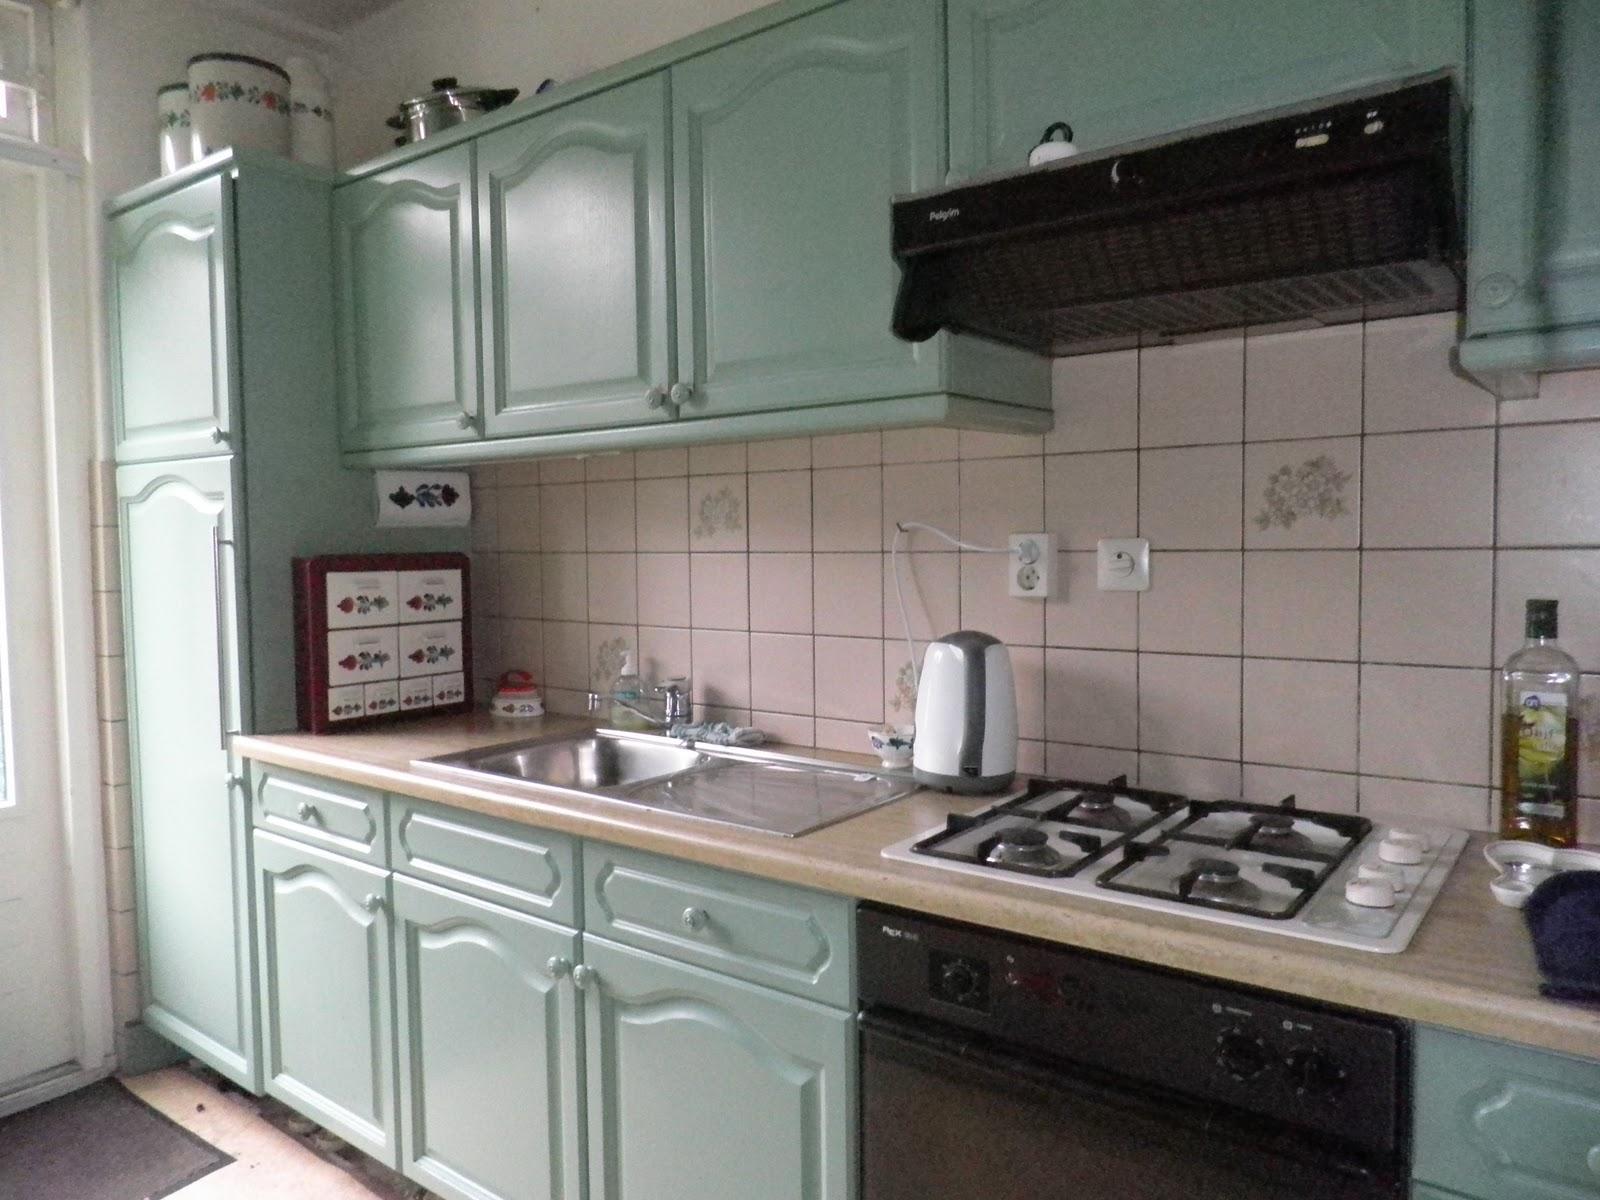 Bolusjes huis en honden: oude keuken afbreken